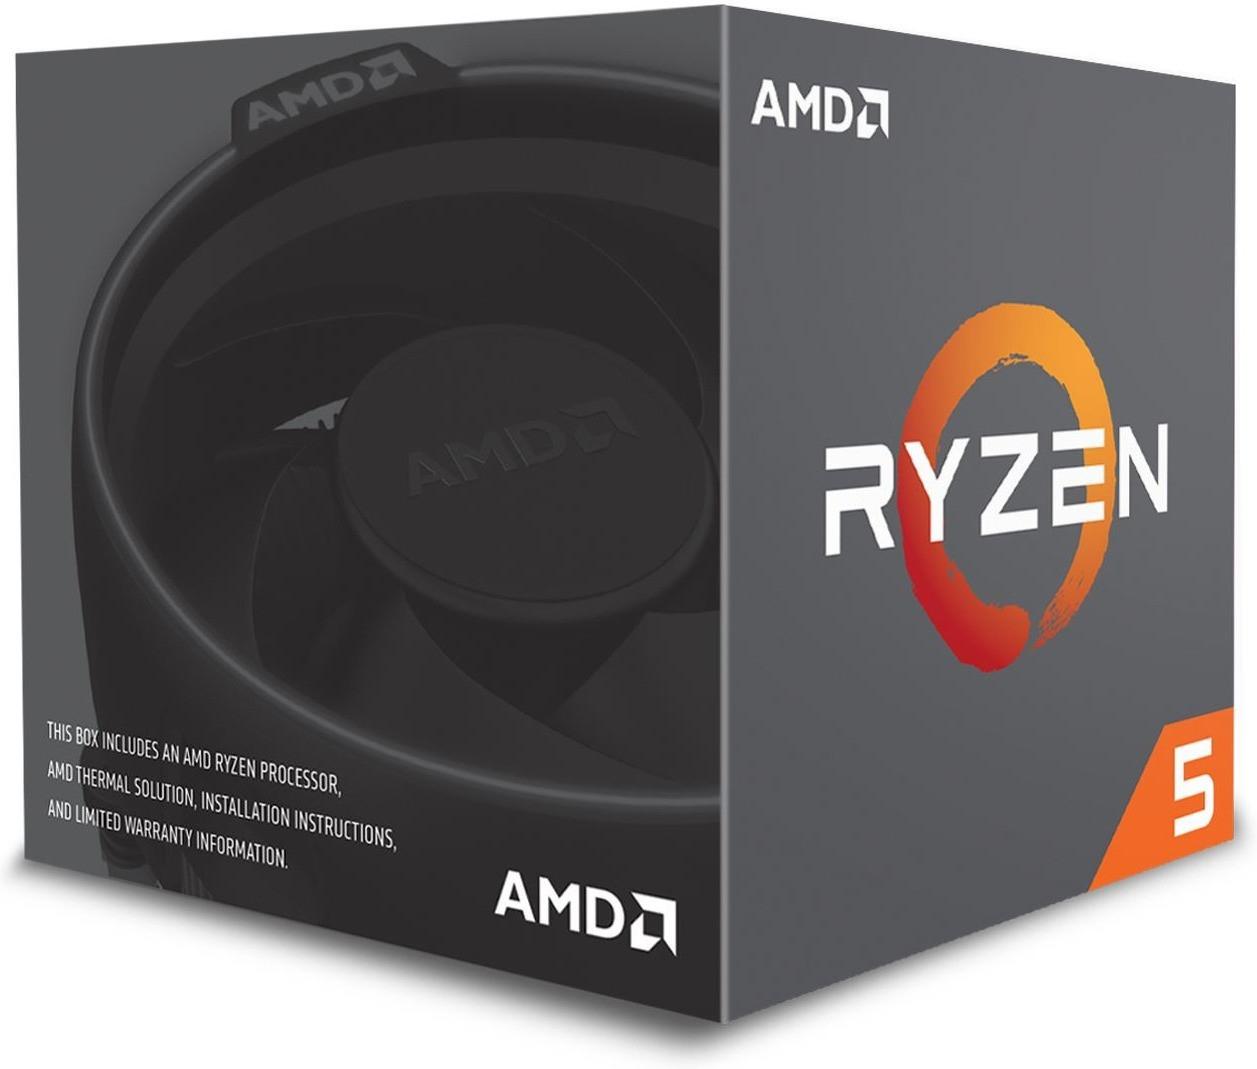 AMD Ryzen 5 2600 Box bei eBay zum neuen Toppreis